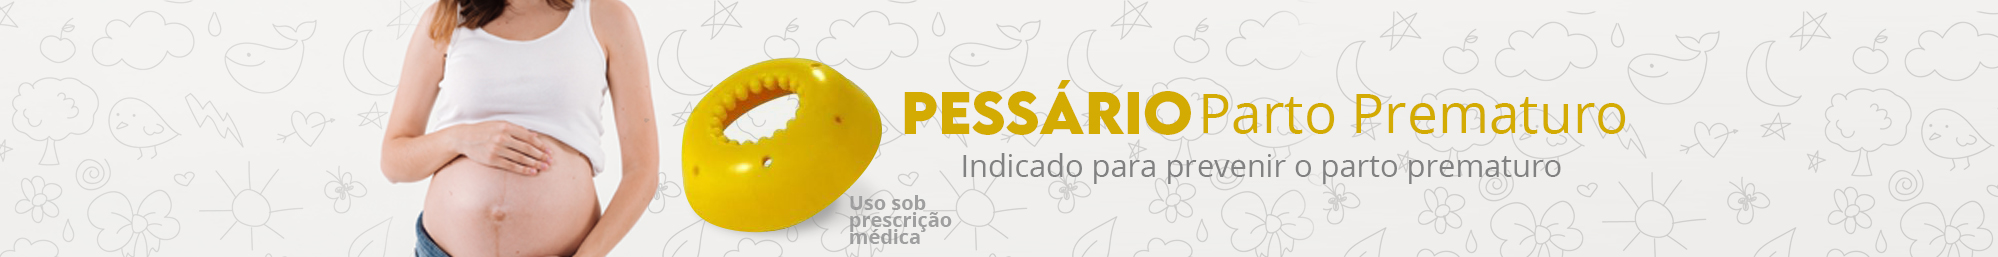 Pessario Parto Prematuro